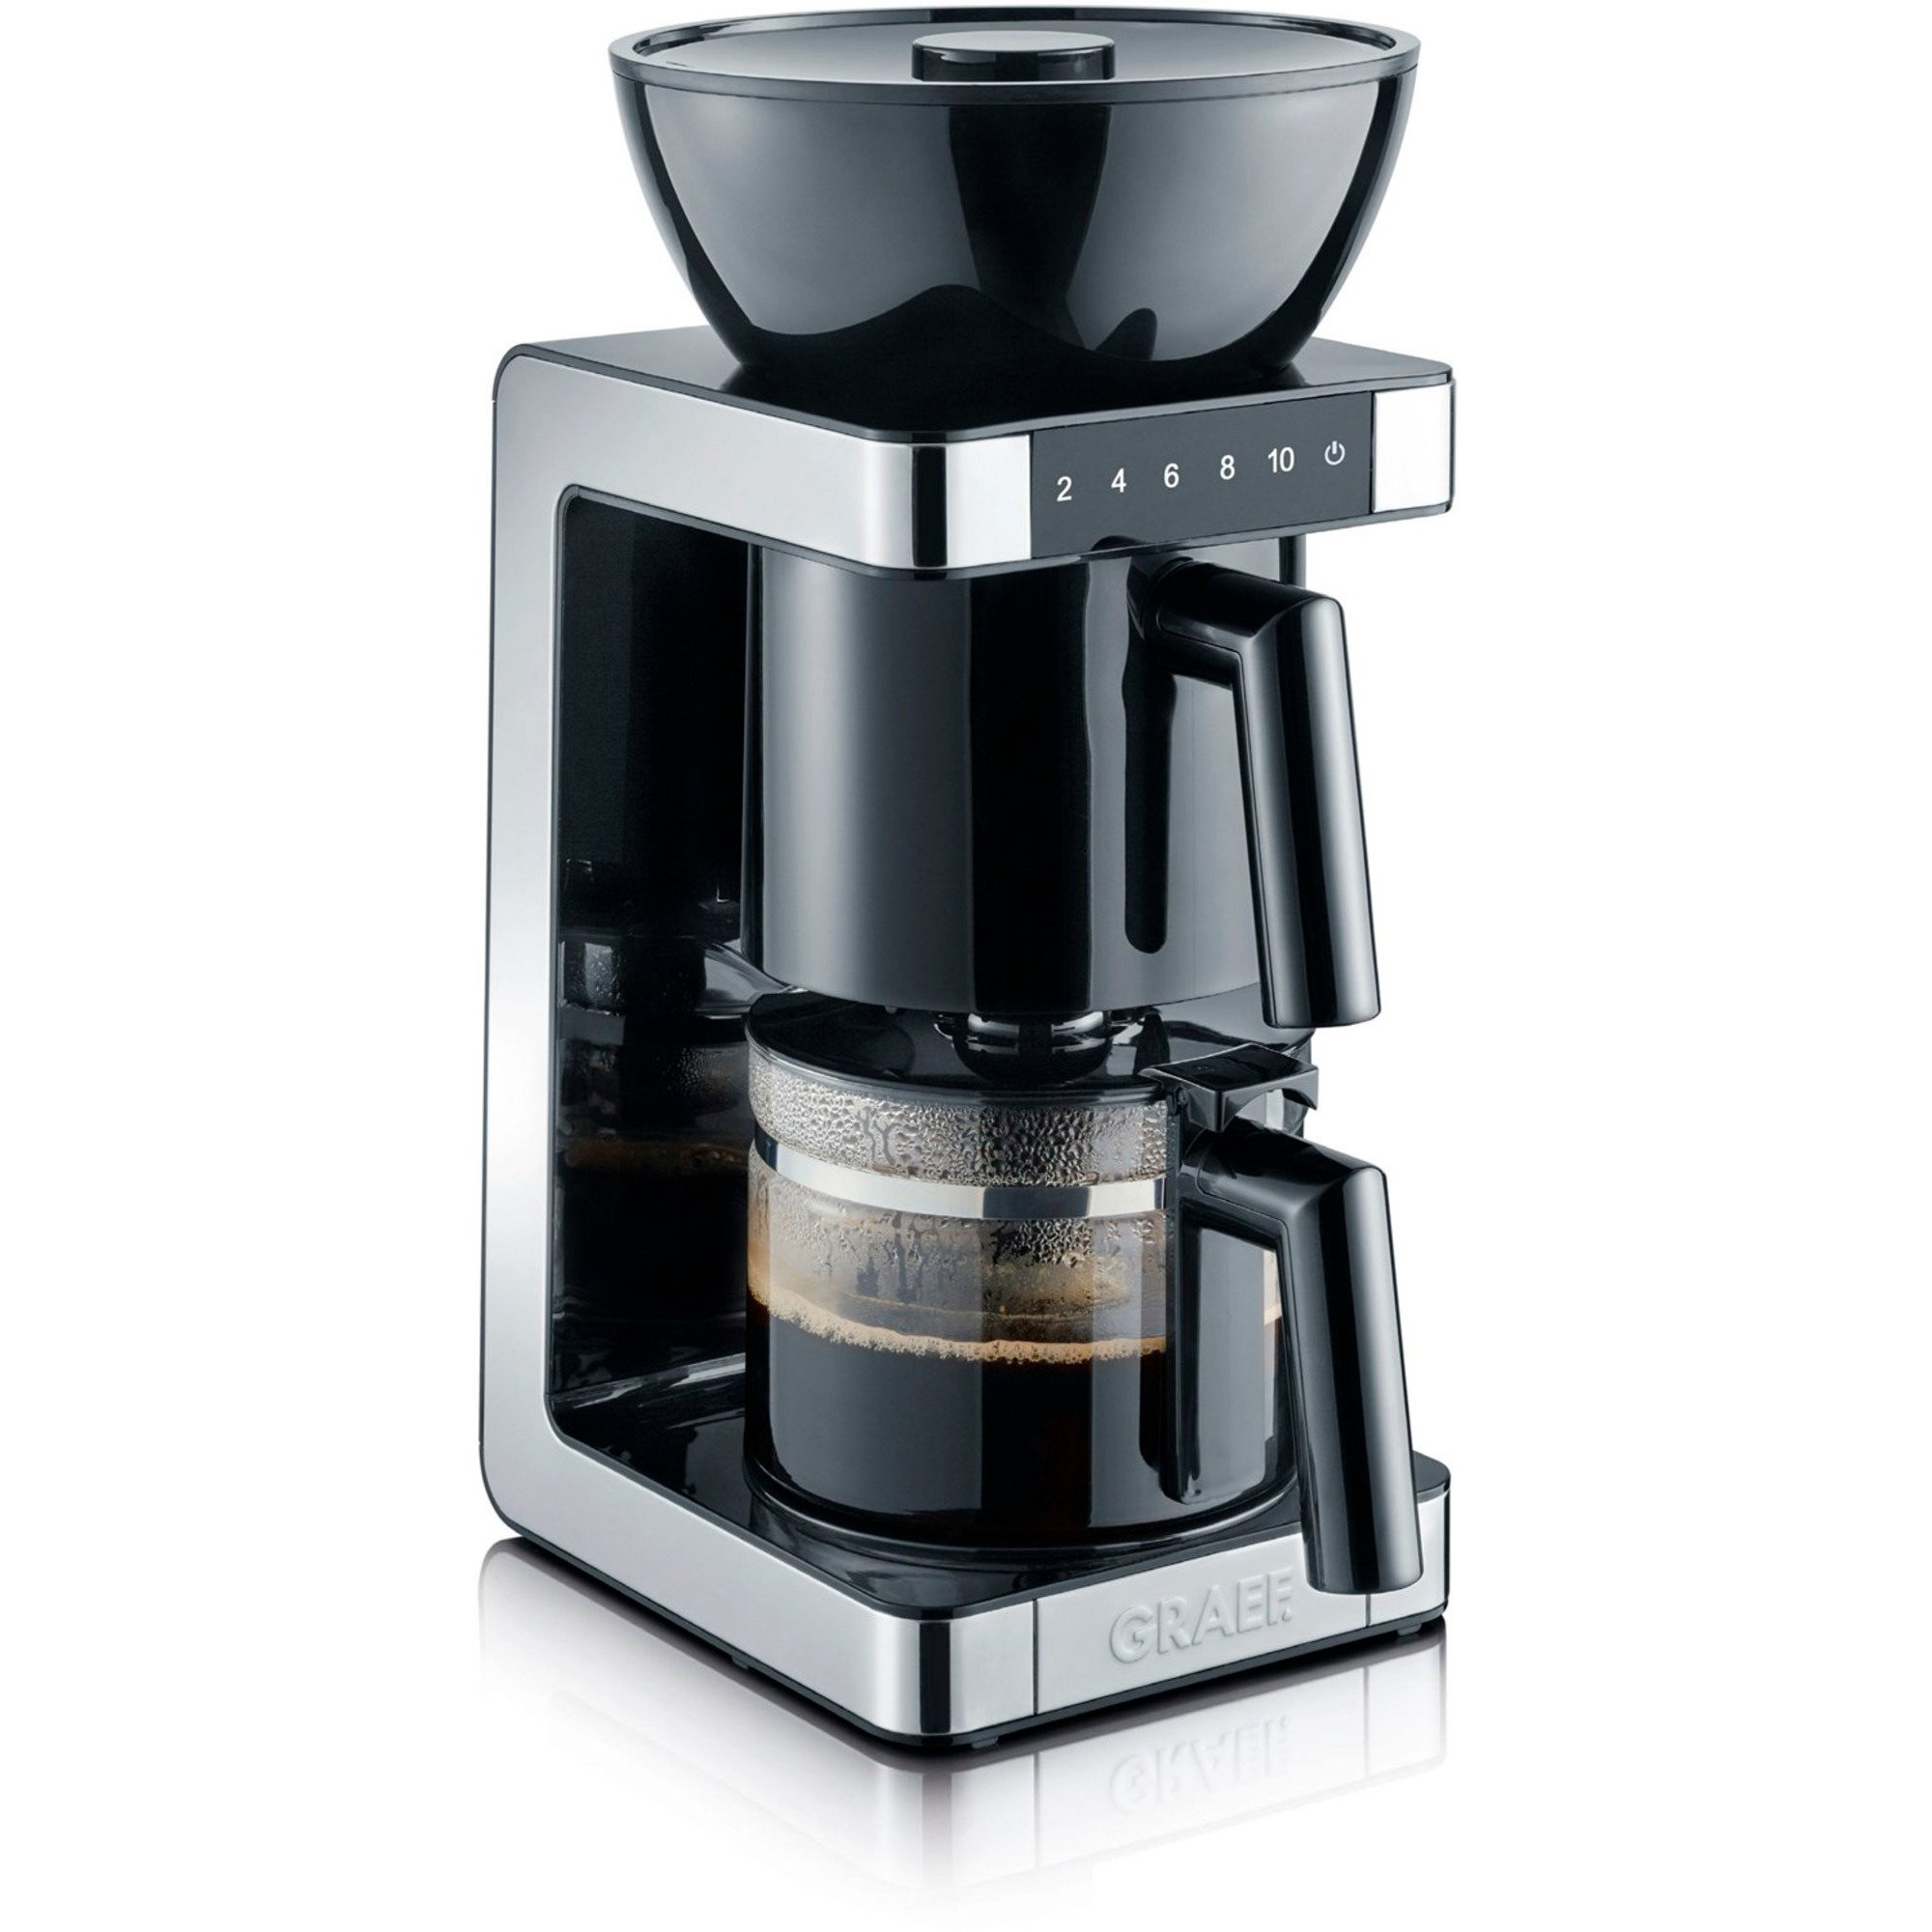 Graef Filterkaffemaskin svart